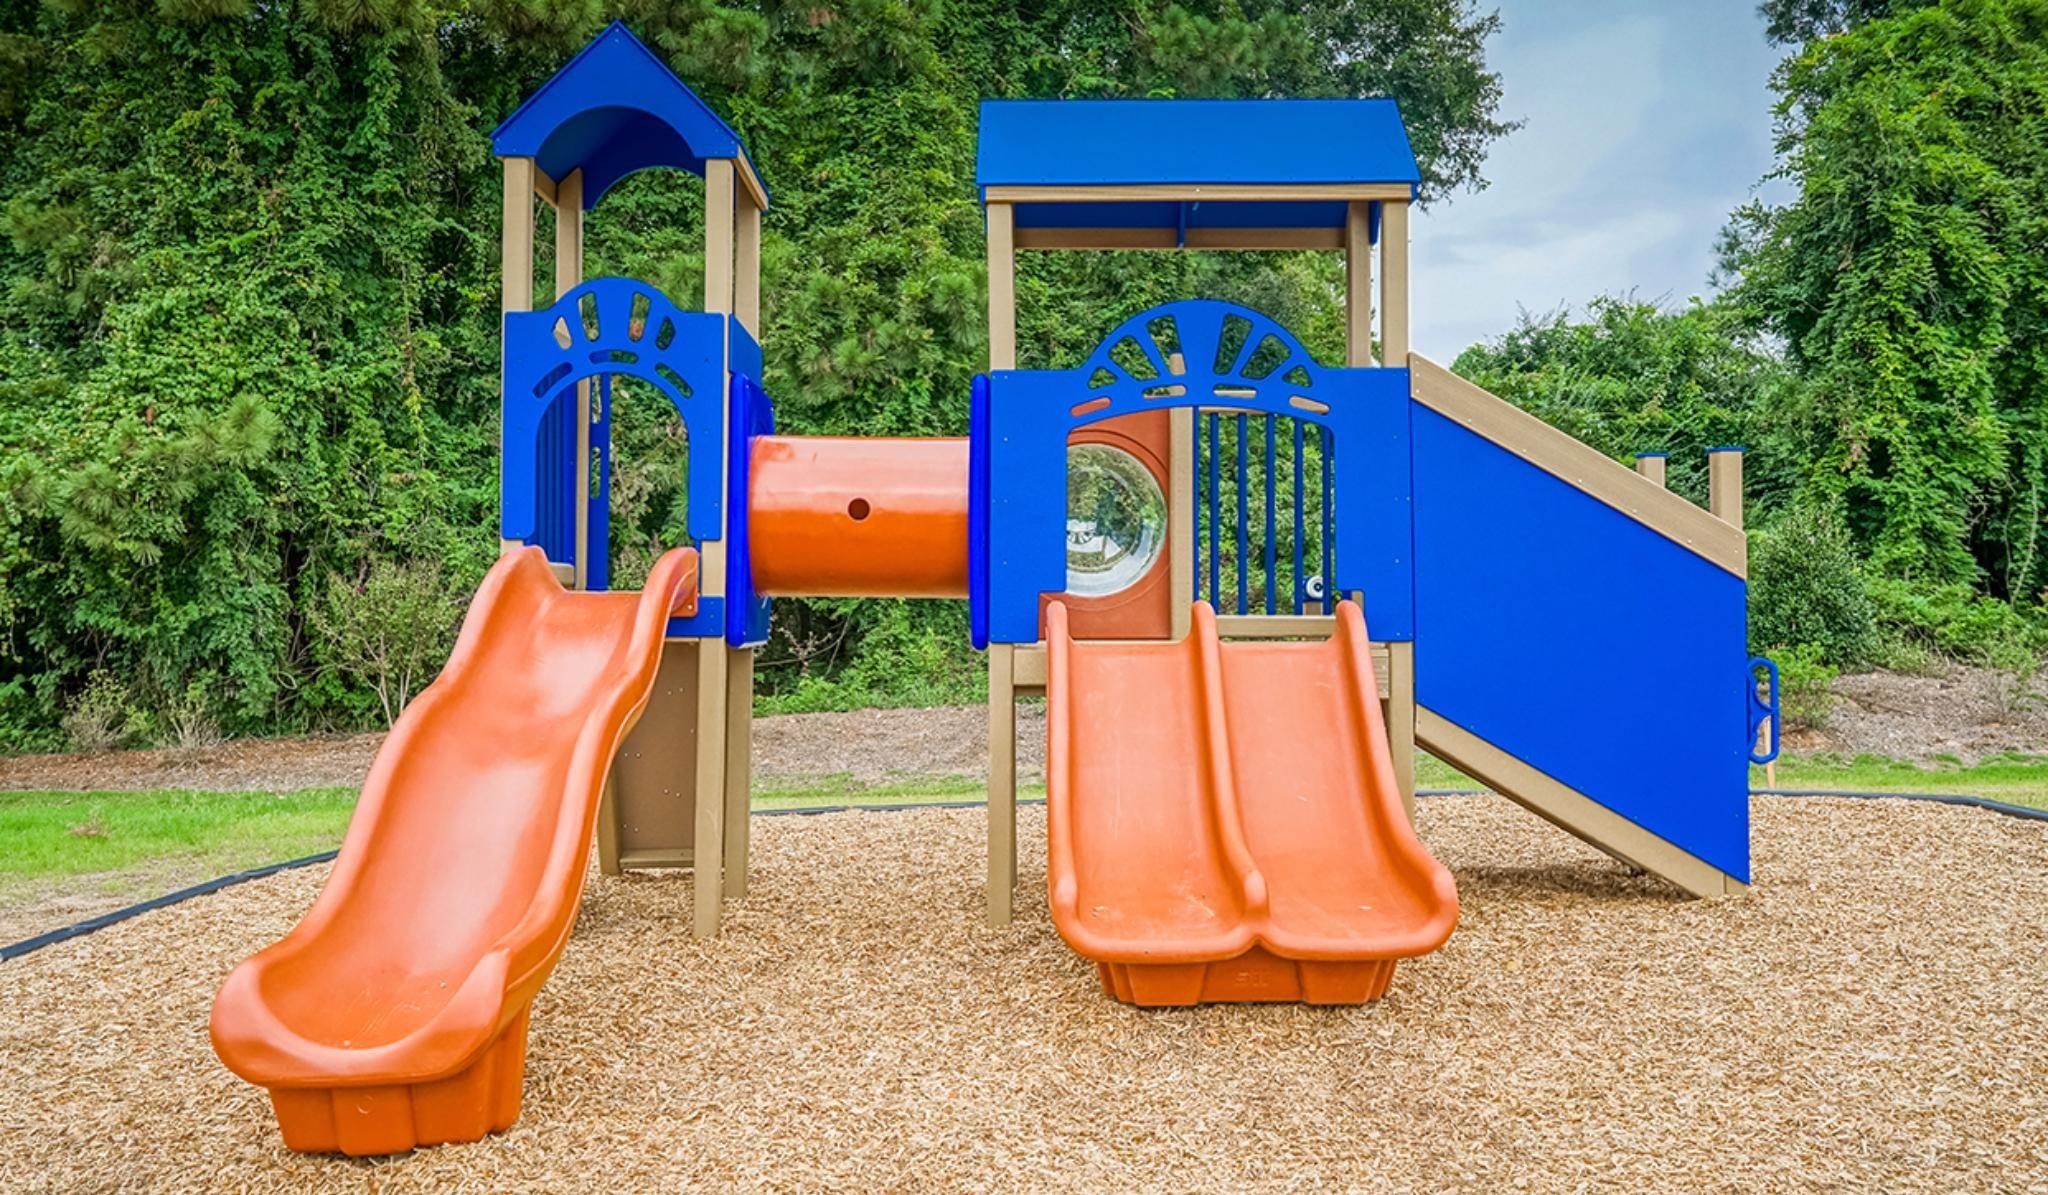 Bristol Community Playground with slides and climb